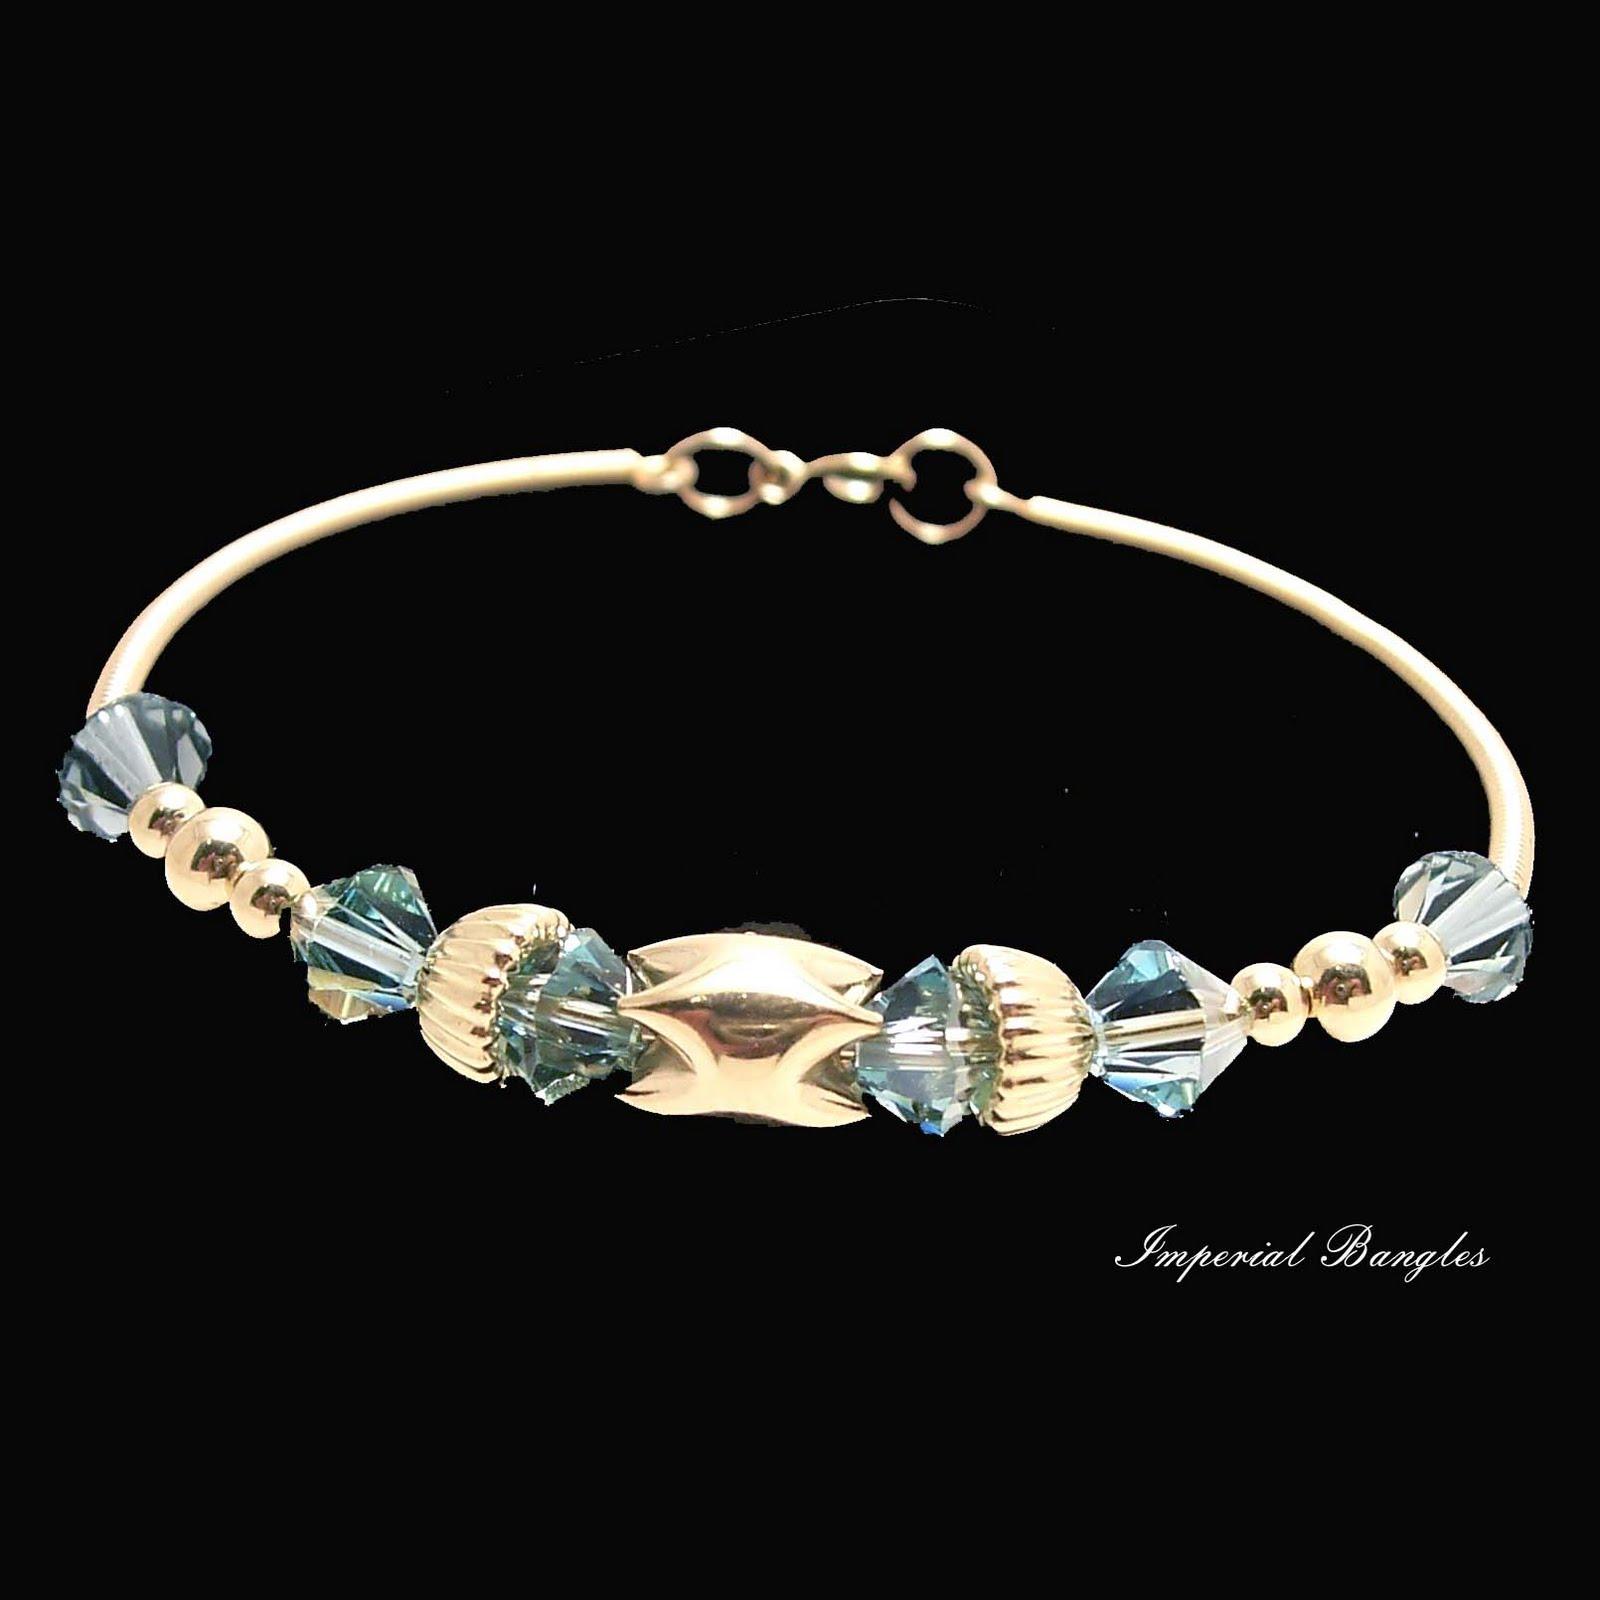 Imperial Bangles Gold Filled Bangle Bracelets III